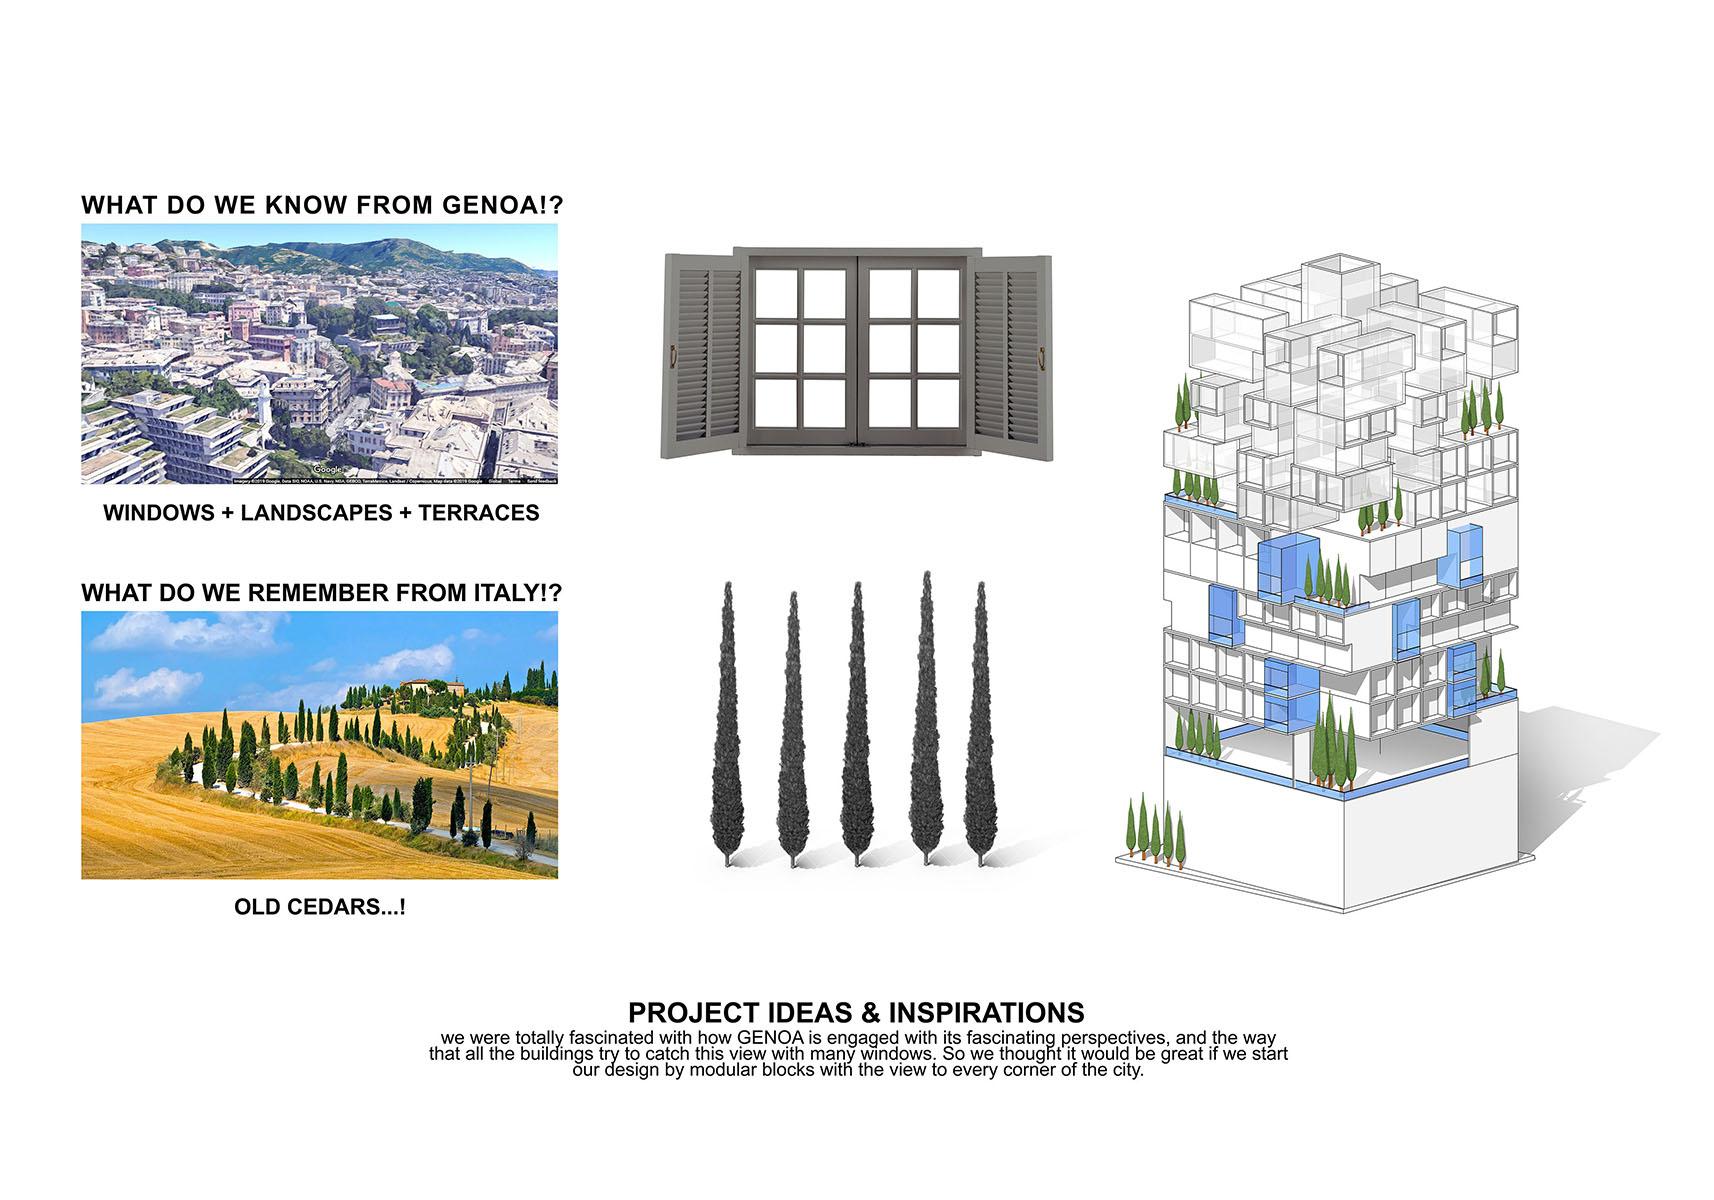 Genoa - A G Tehrani Design Studio - 02 - Section